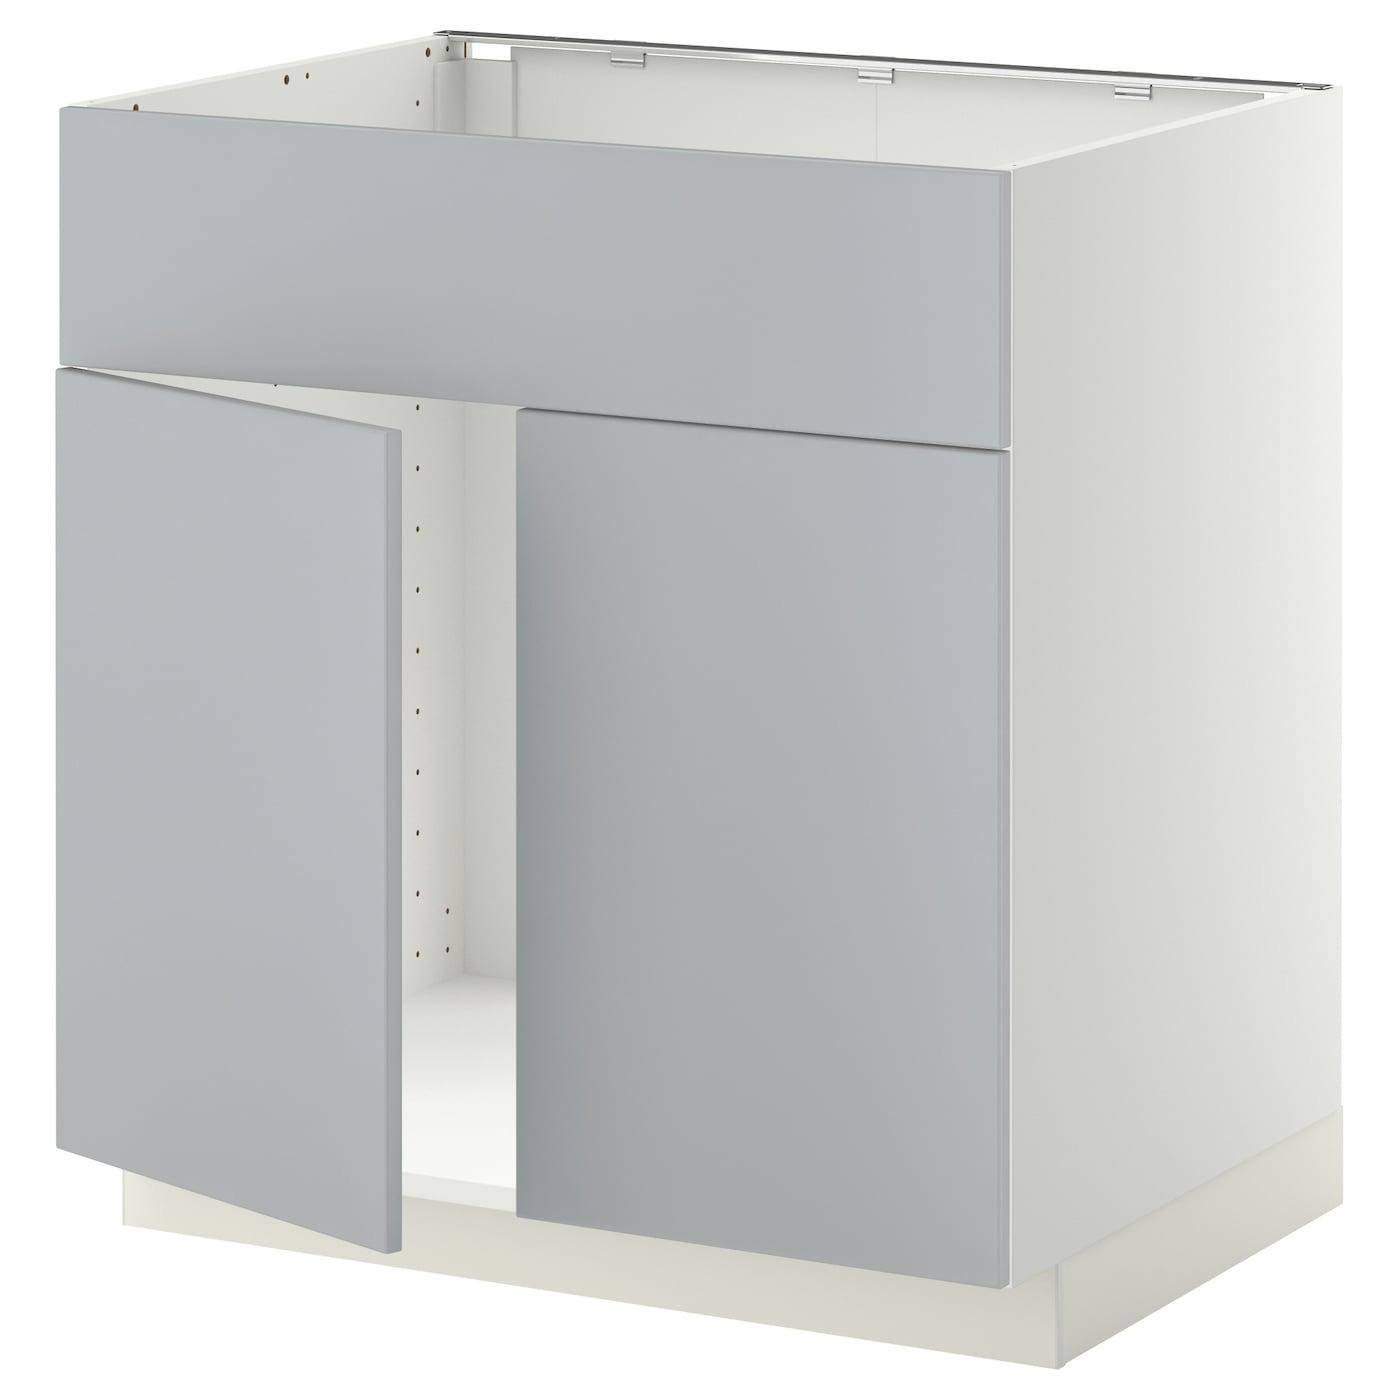 Metod Base Cabinet F Sink W 2 Doors Front White Veddinge Grey 80x60 Cm Ikea